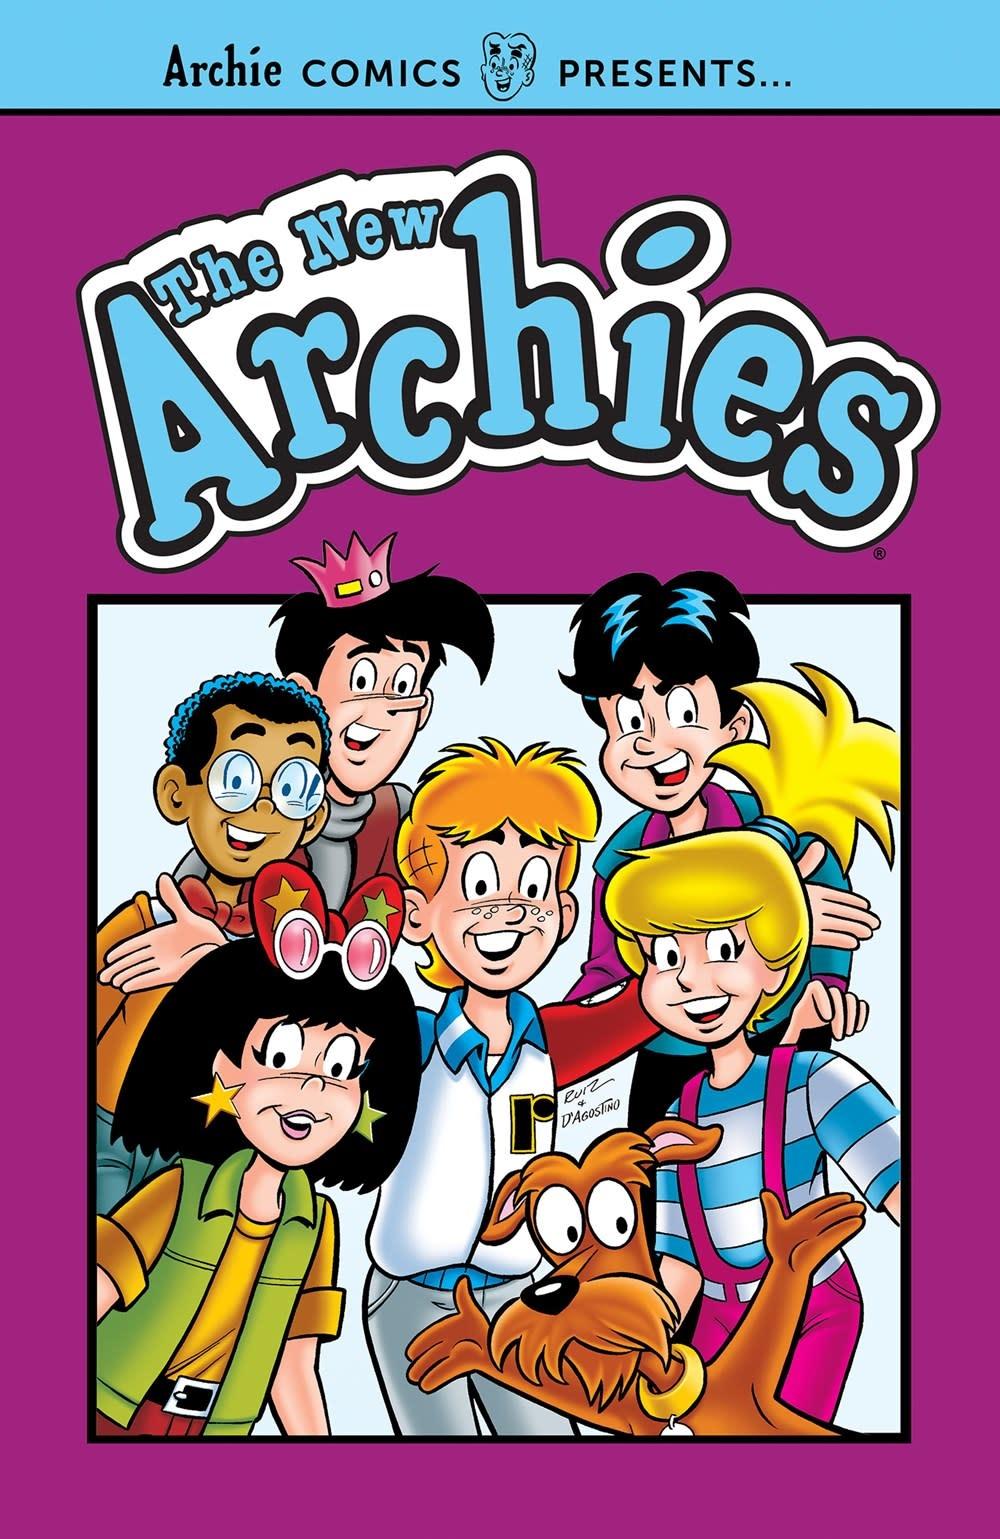 Archie Comics Archie: The New Archies